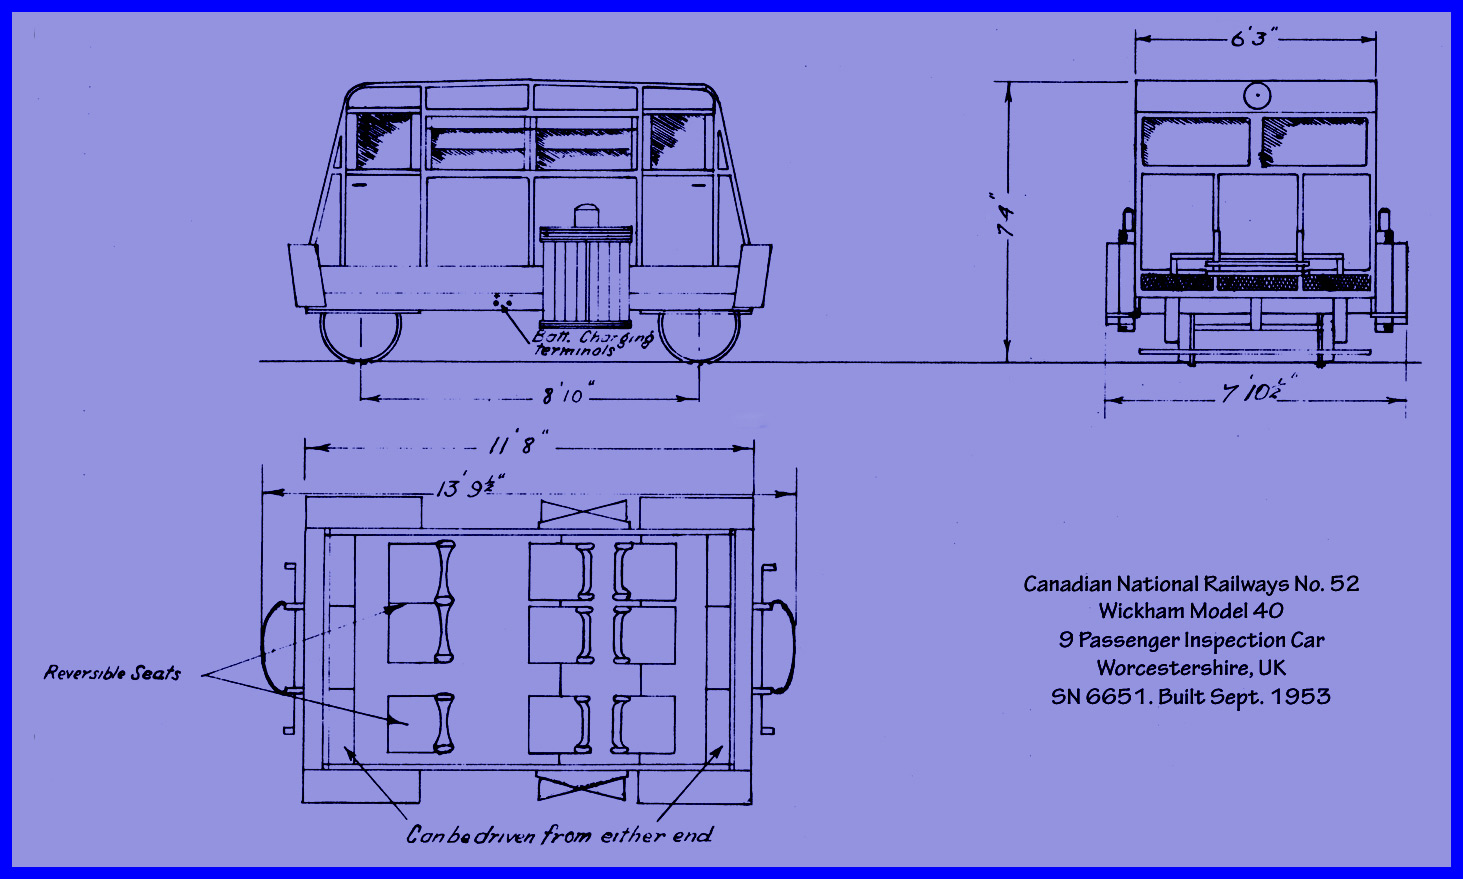 Car Damage Inspection Diagram Yamaha Xs650 Chopper Wiring Sheet Free Engine Image For User